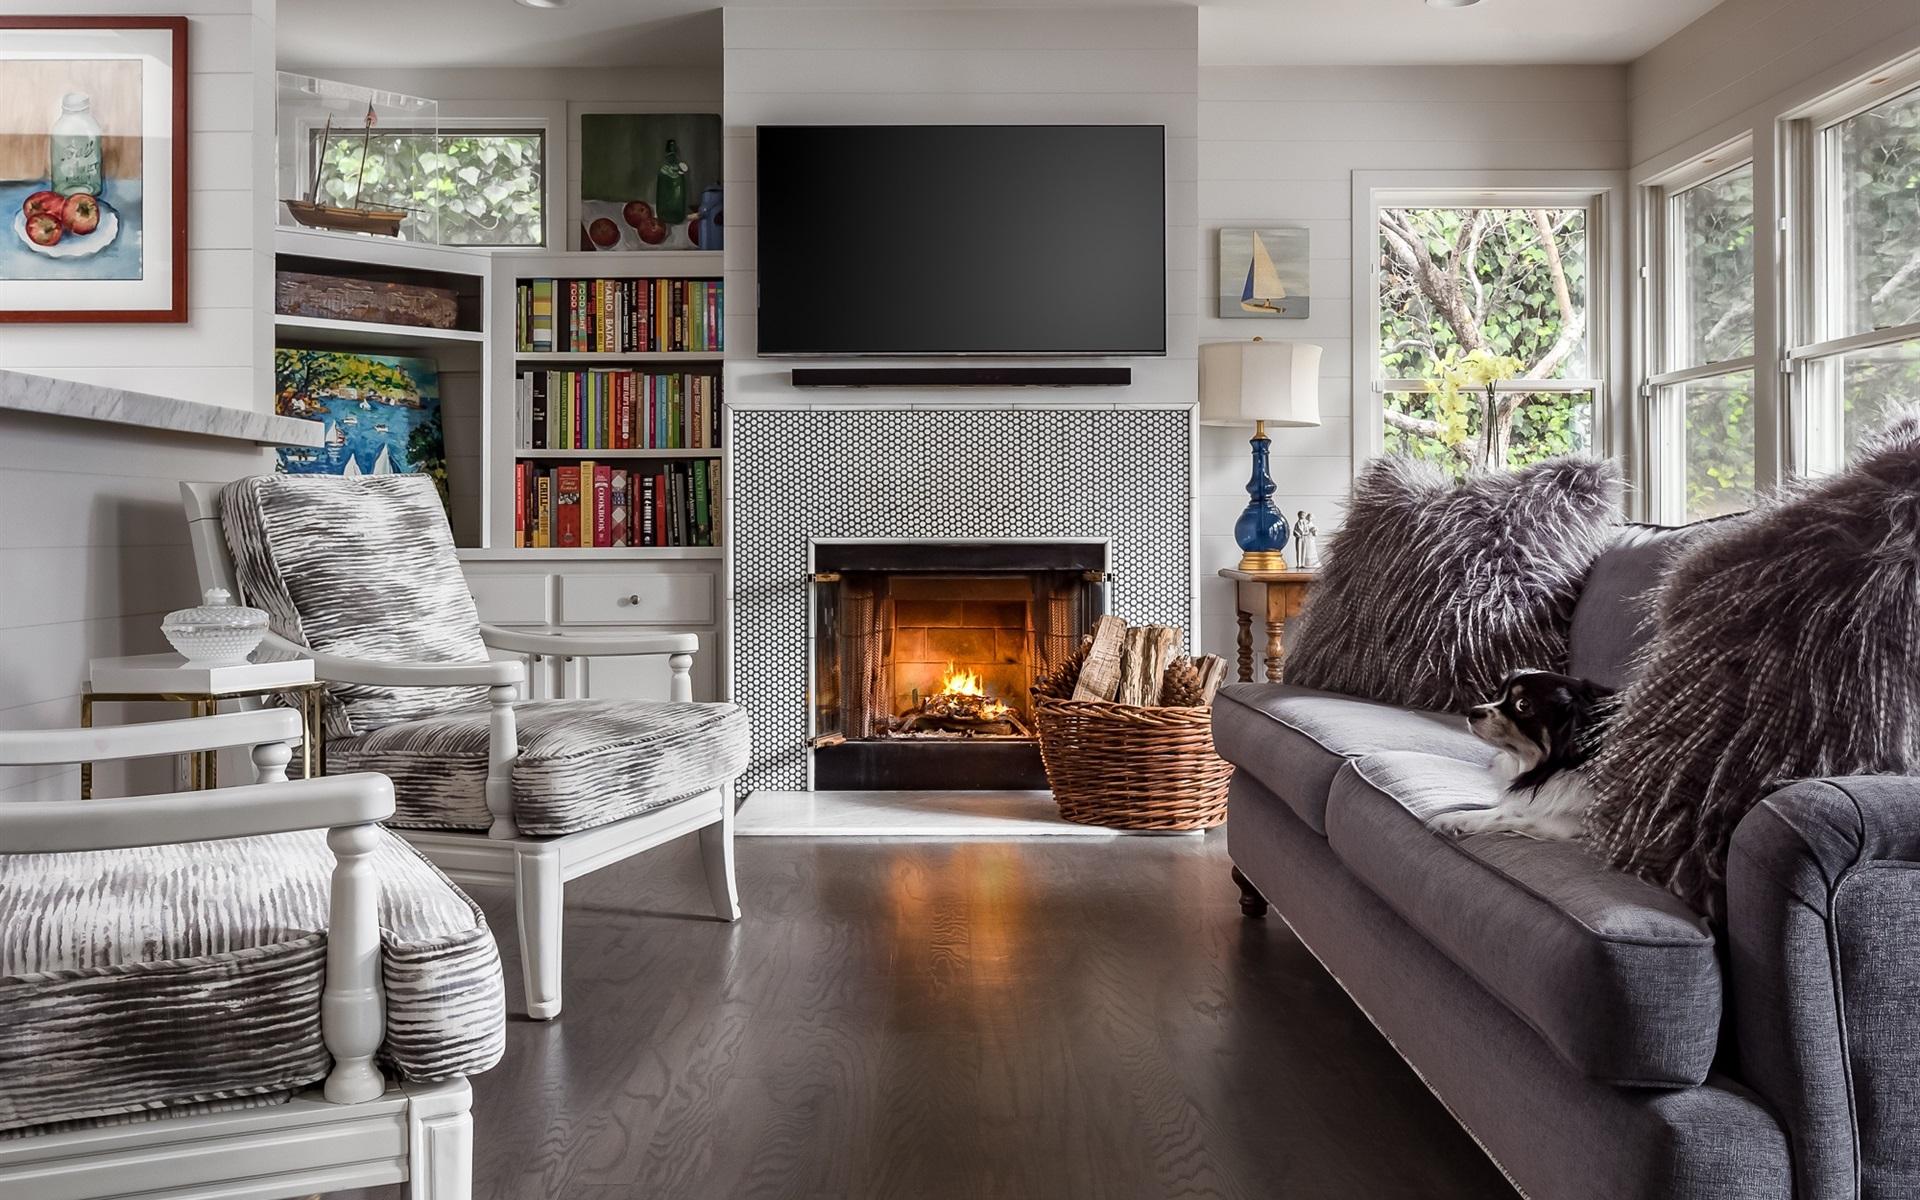 fonds d 39 cran salon chemin e canap chaise livres t l vision 1920x1200 hd image. Black Bedroom Furniture Sets. Home Design Ideas